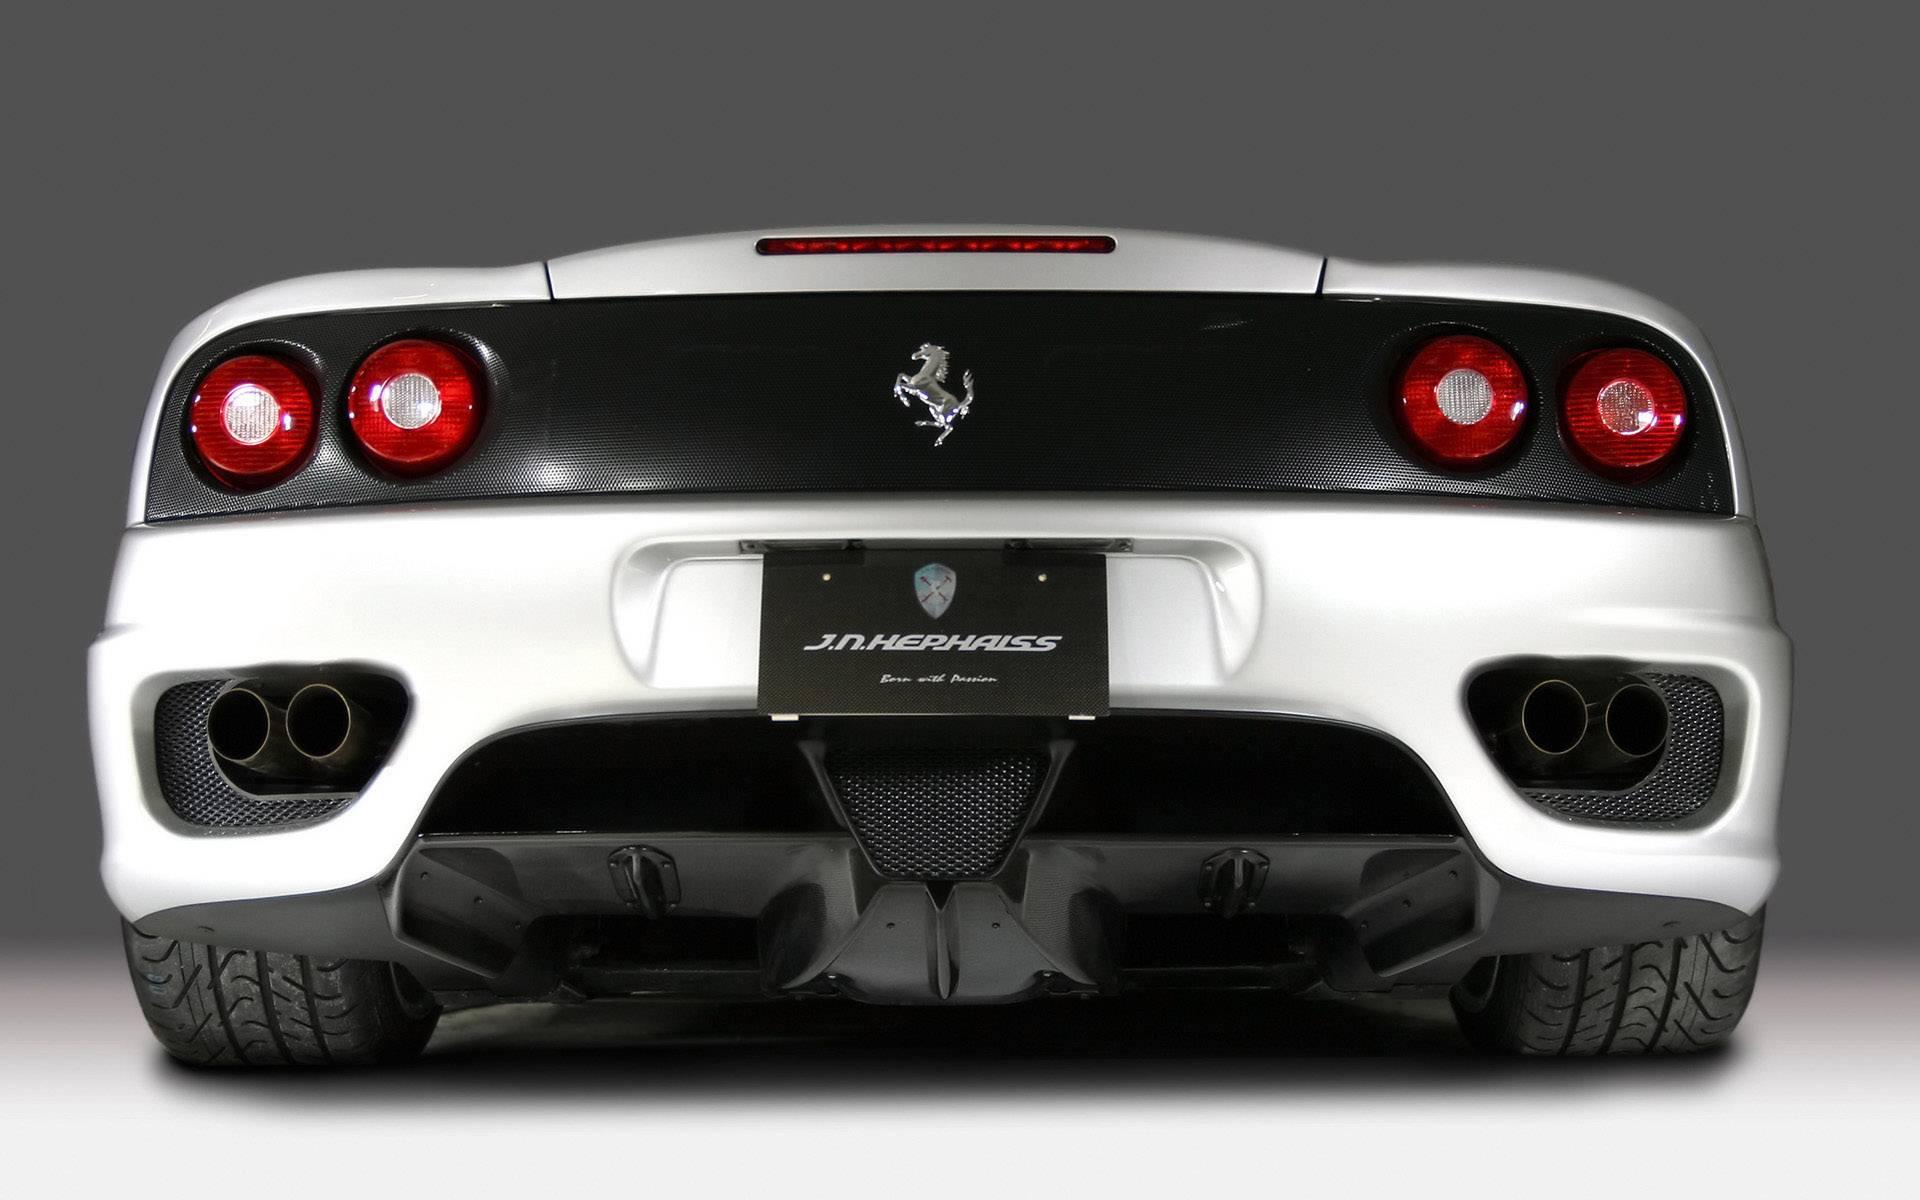 Ferrari White Cool Ferrari World Cars High Resolution Wallpaper Free